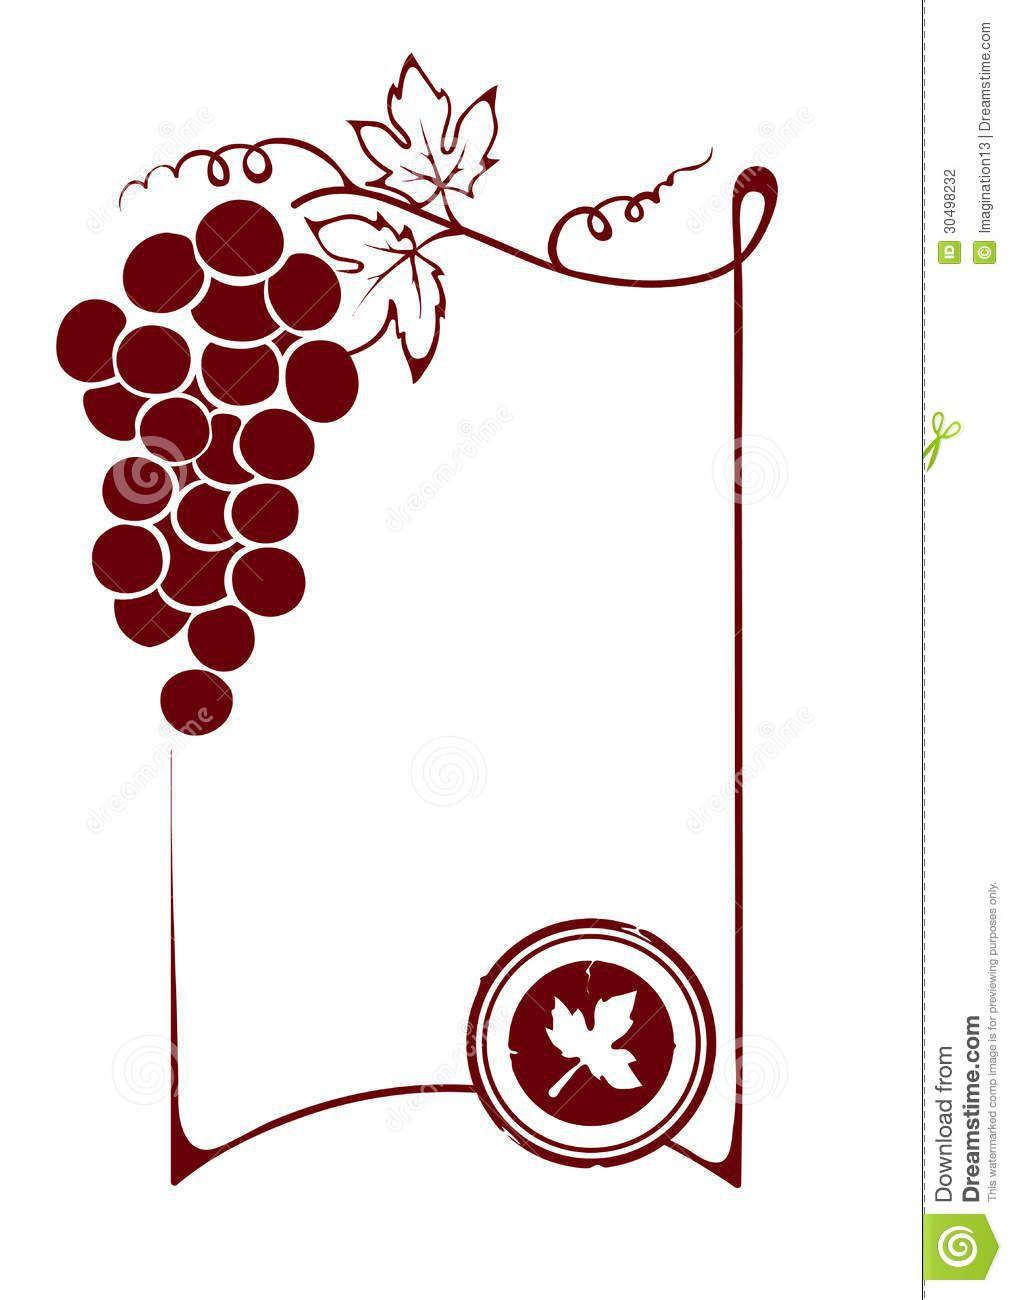 004 Imposing Free Wine Label Template Idea  Online Custom Downloadable BottleFull